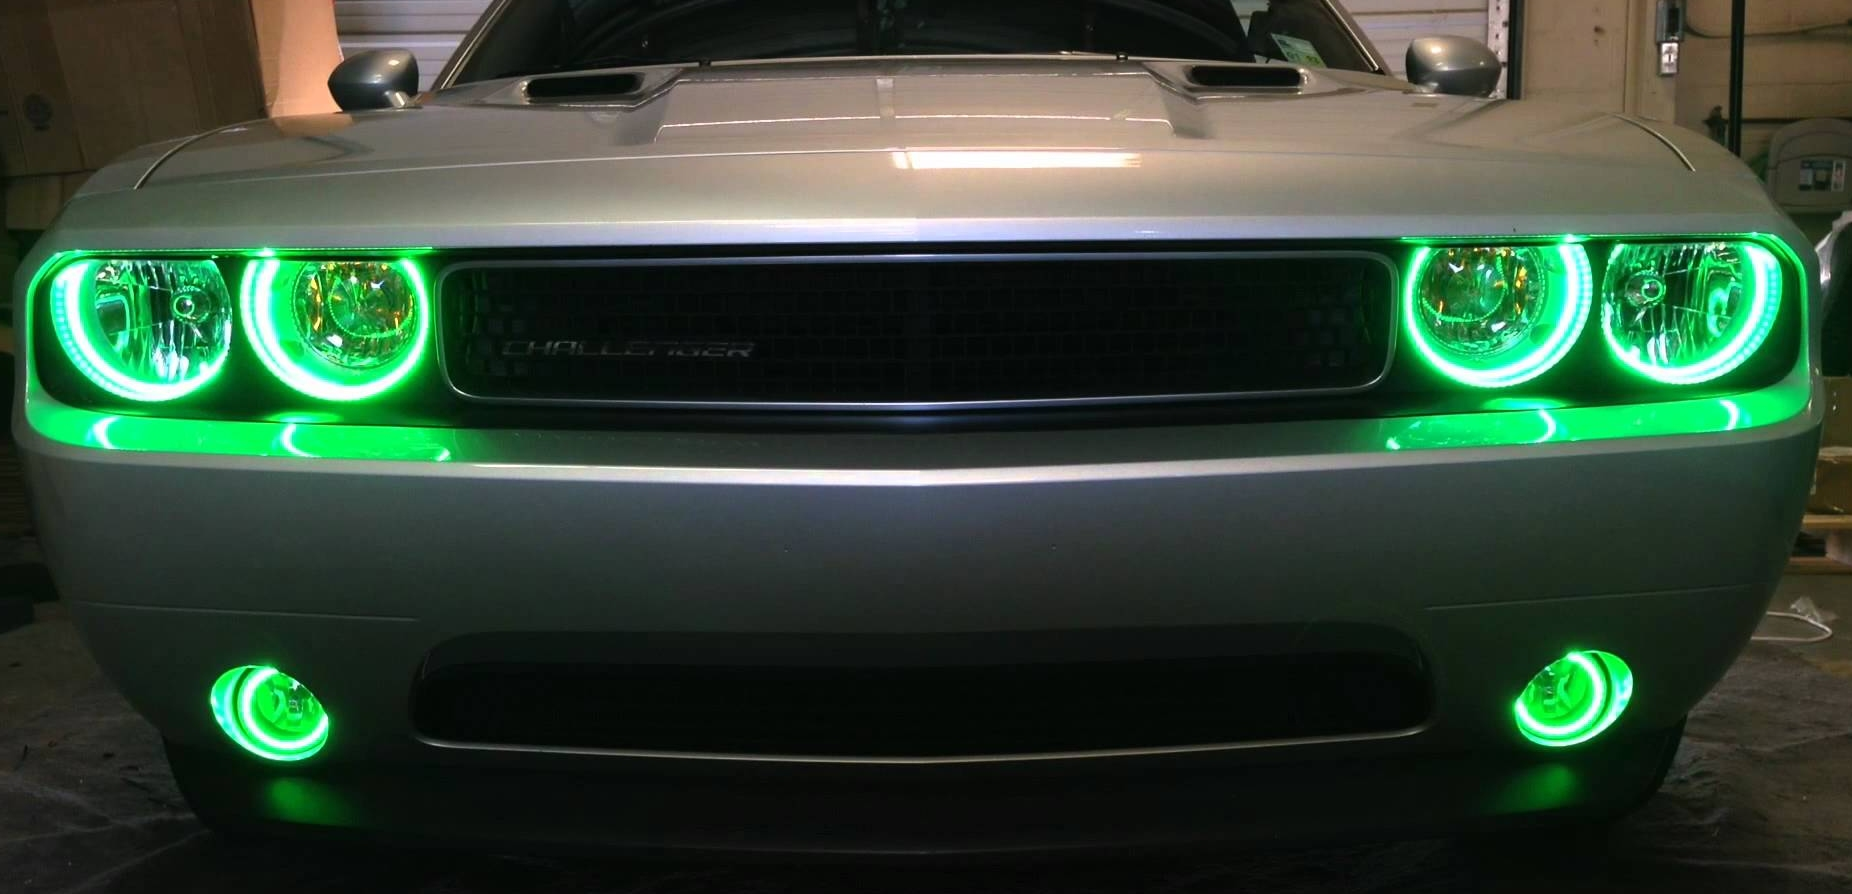 2009 2017 Dodge Challenger Srt8 Headlight Halo Kits